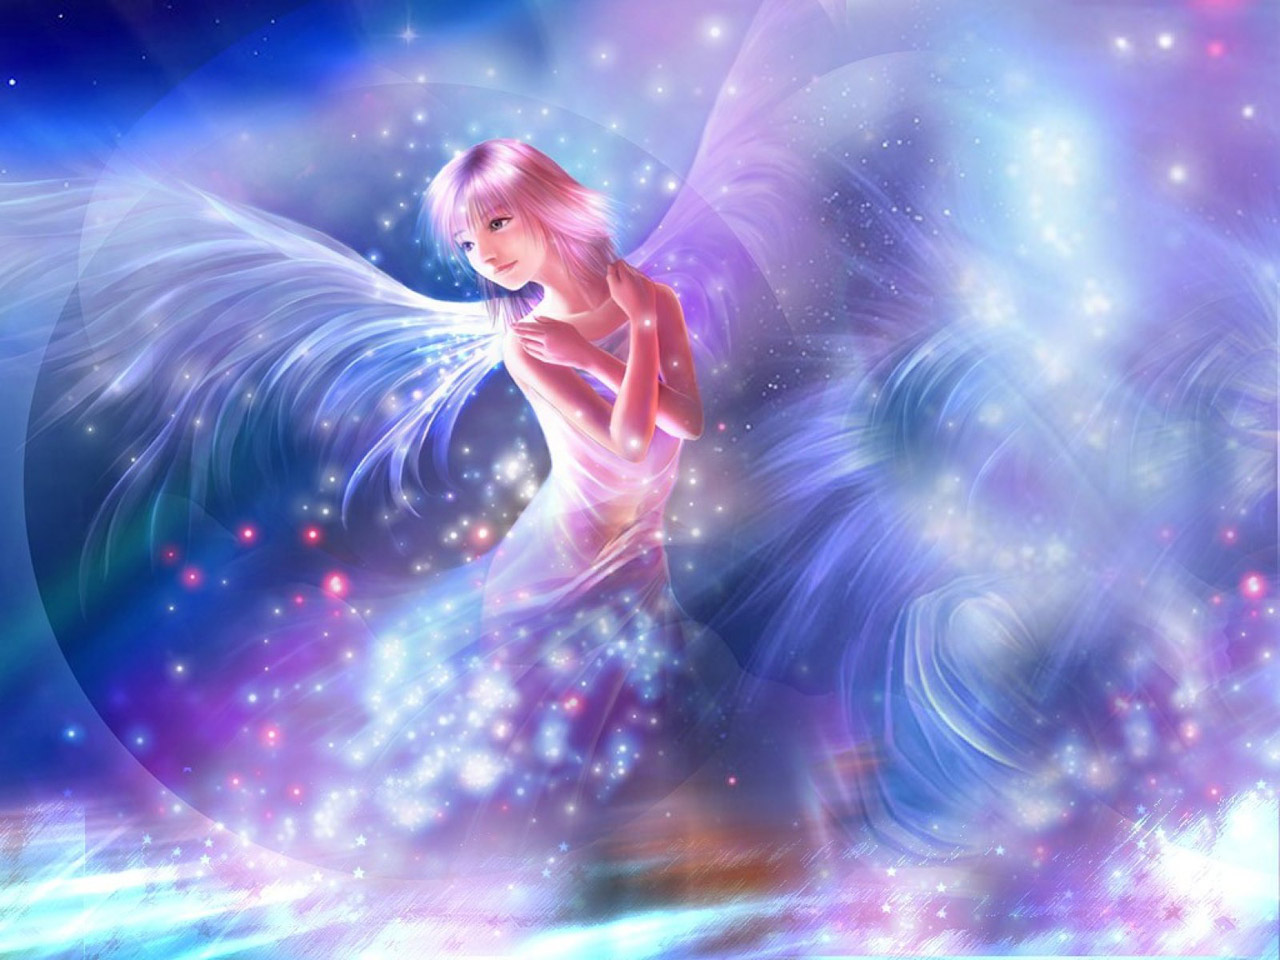 size 1280x960 desktop wallpaper of shining angel fantasy 1280x960